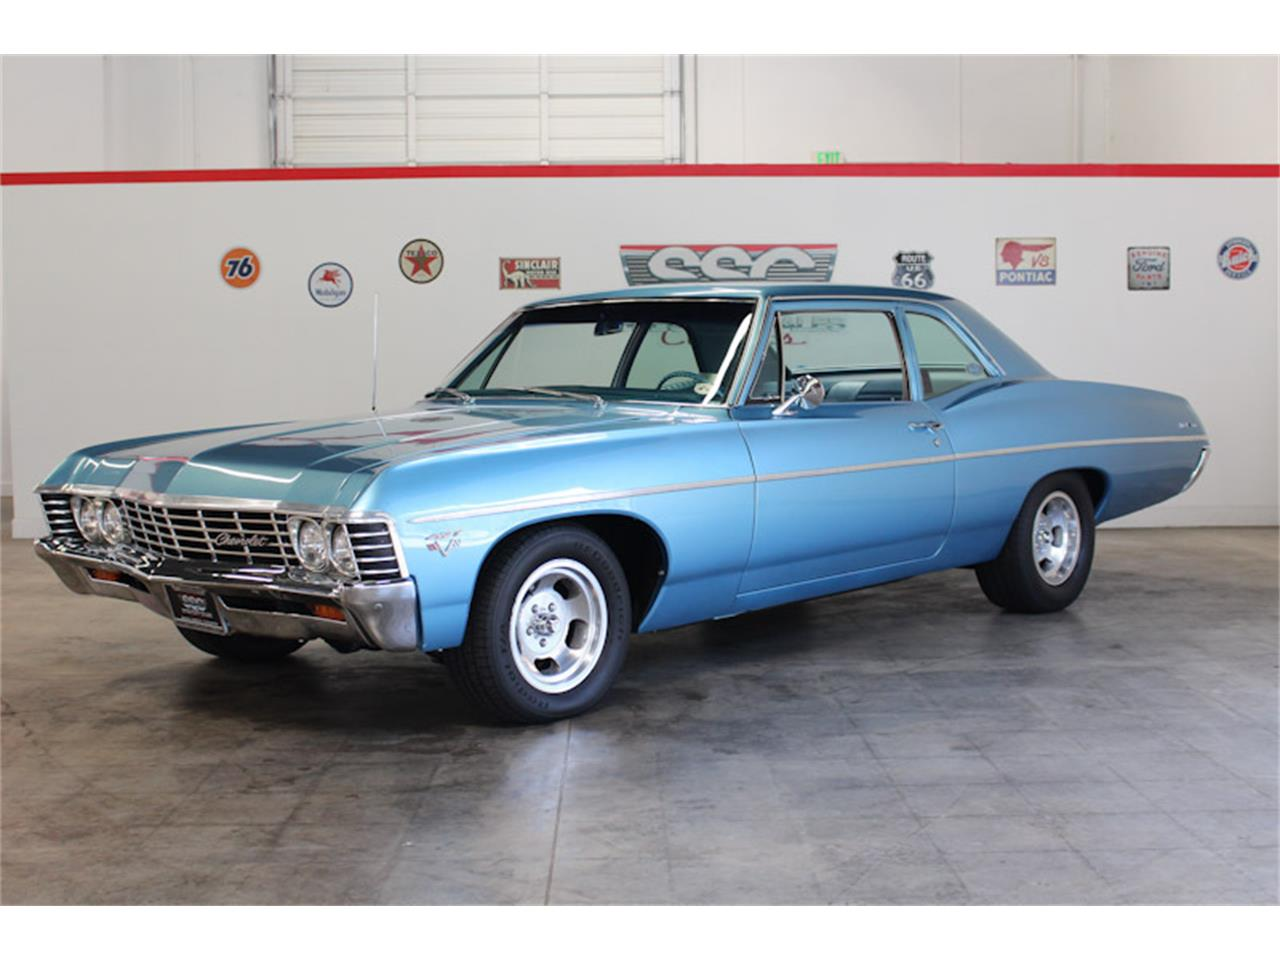 For Sale 1967 Chevrolet Bel Air In Fairfield California